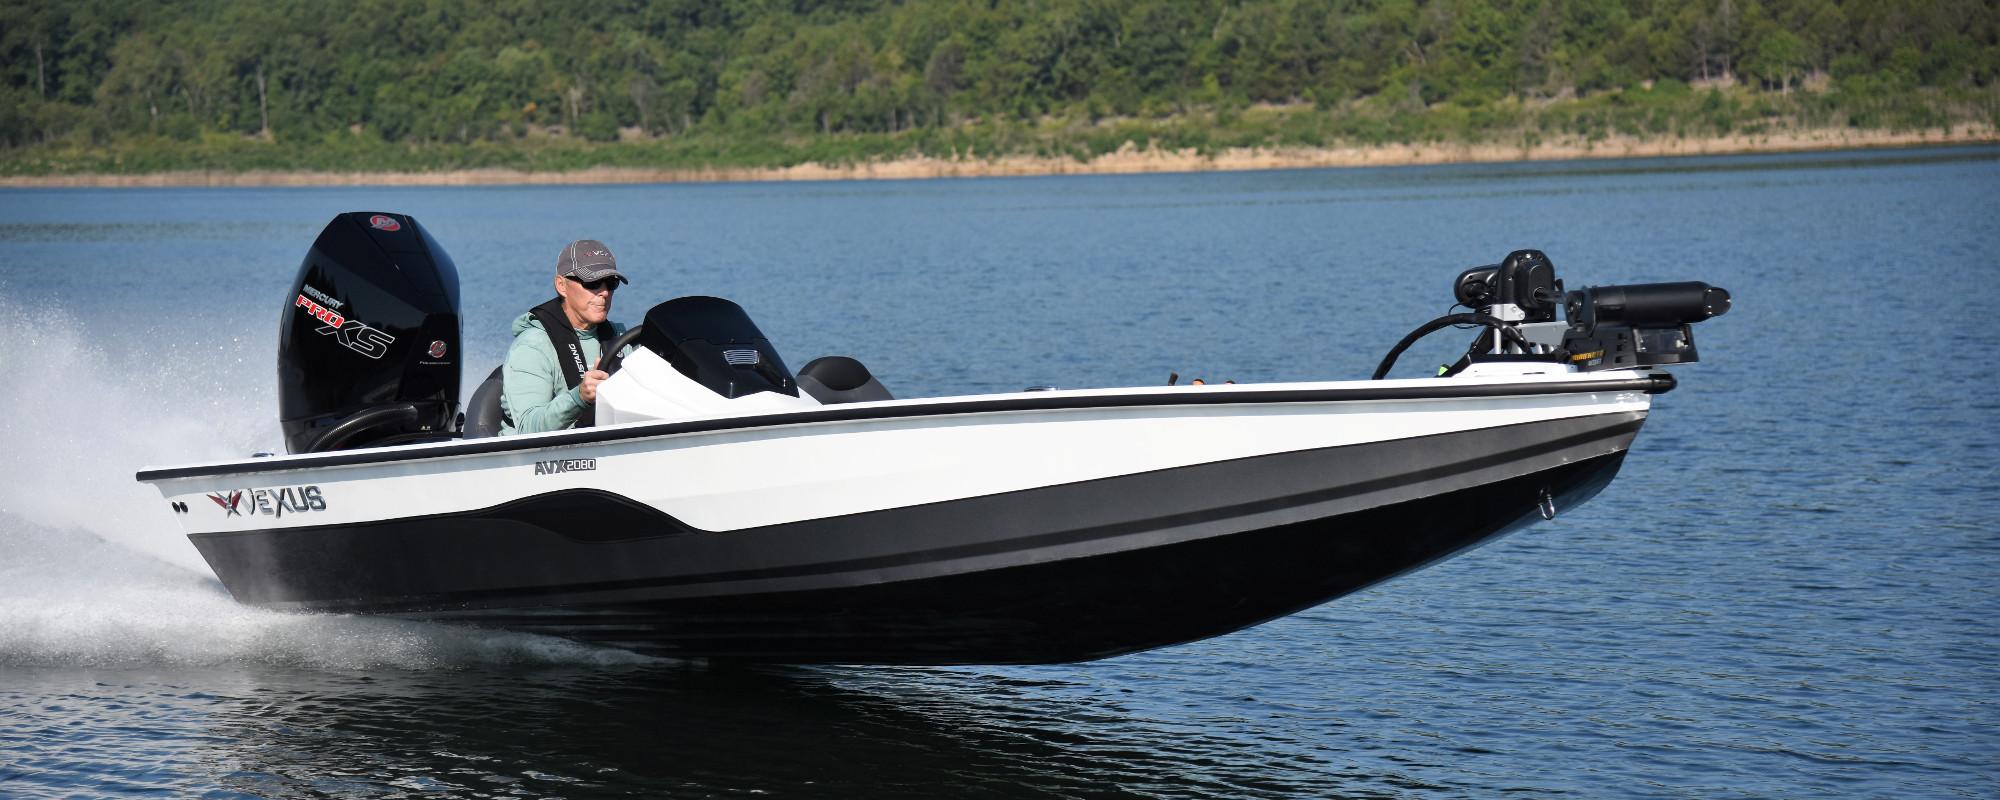 avx2080 vexus boats fishing boat manufacturer